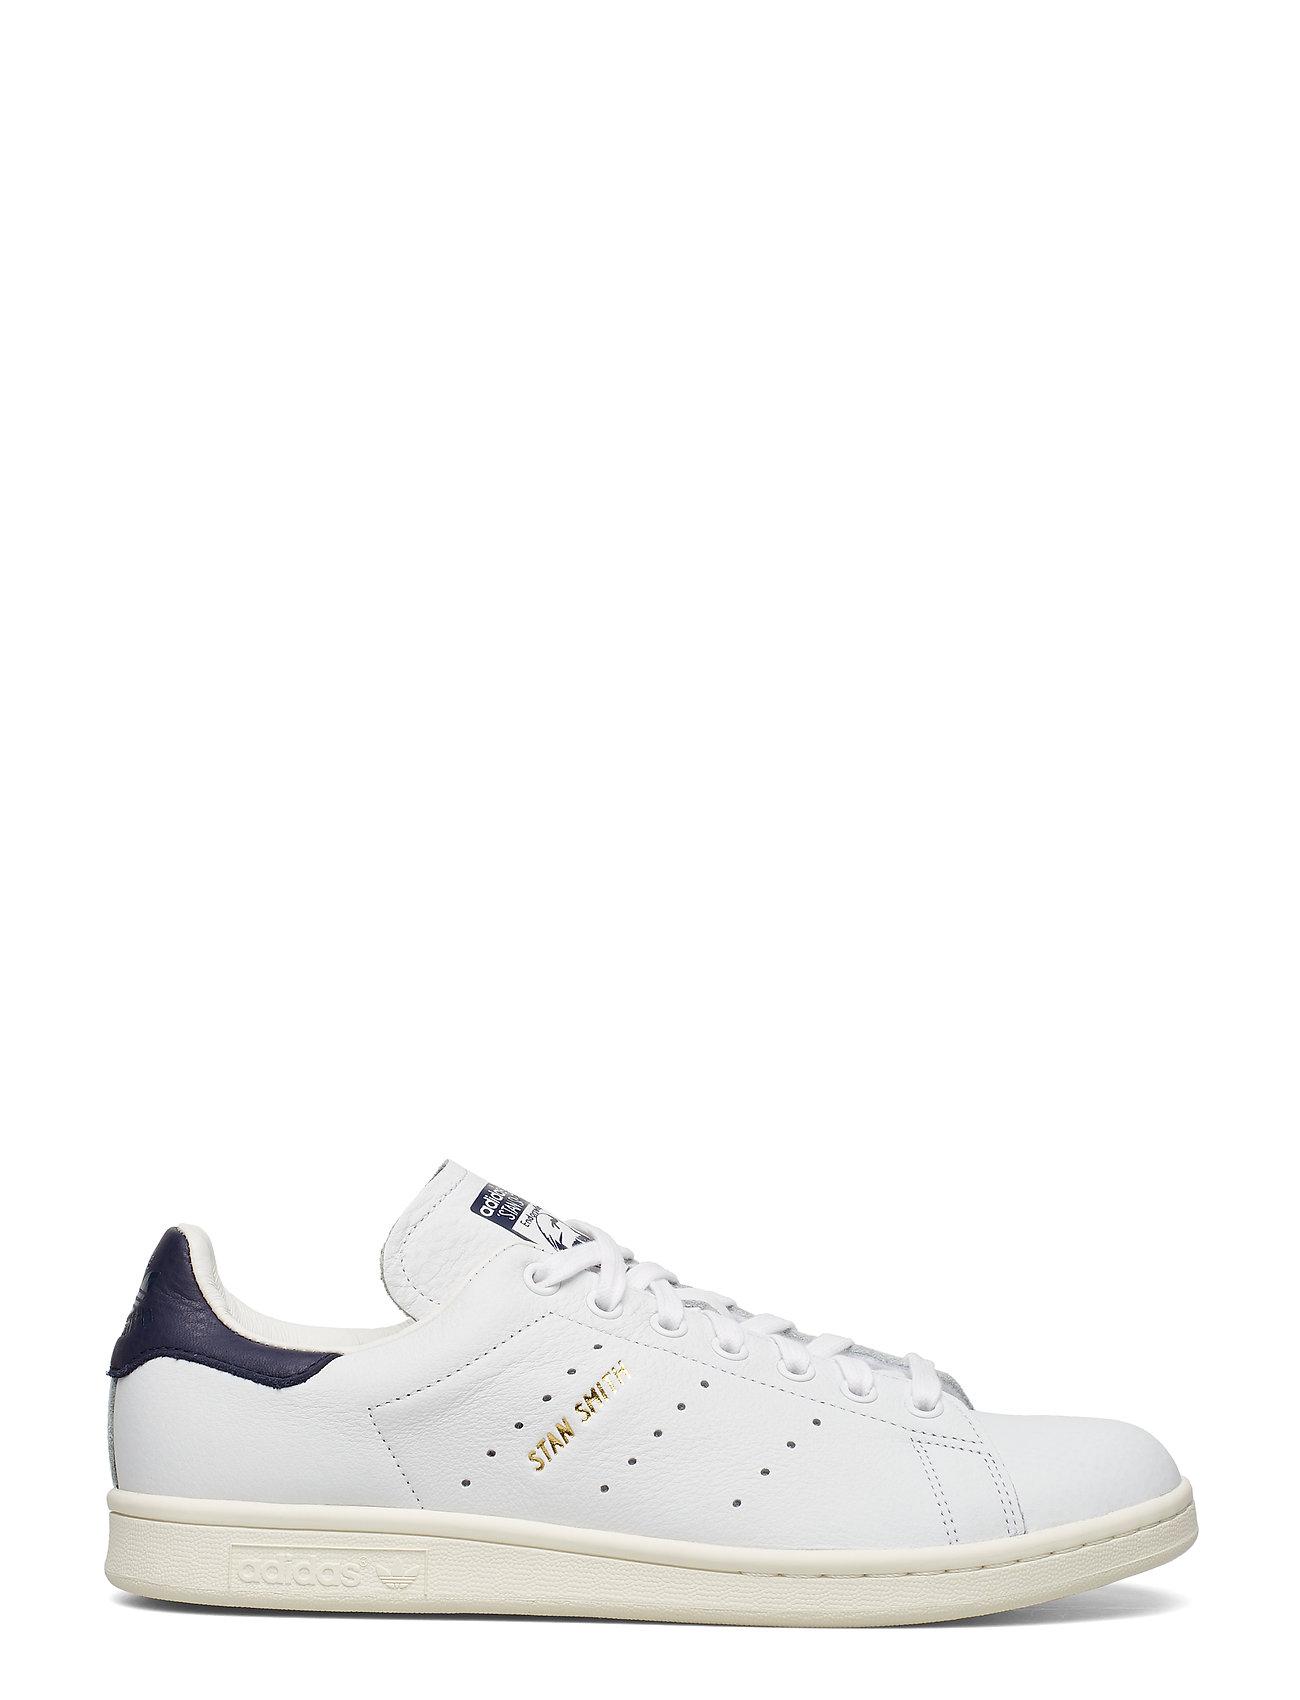 Dyreste Adidas Originals Sko Børn, Adidas Originals Sko